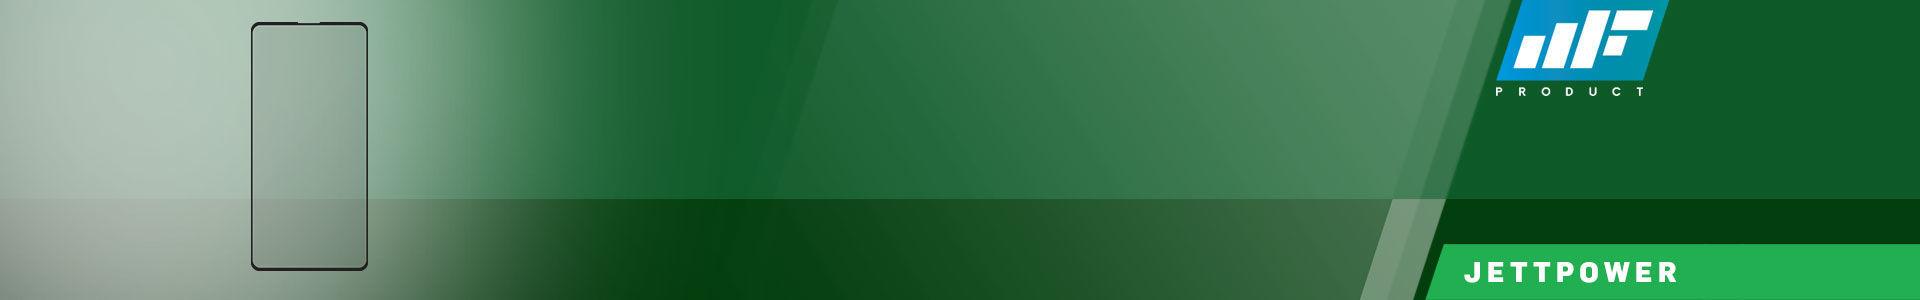 MF Product Jettpower 0443 Renklı Ekran Koruyucu Cam Xiaomi Mi 9T hemen al, hemen gelsin!